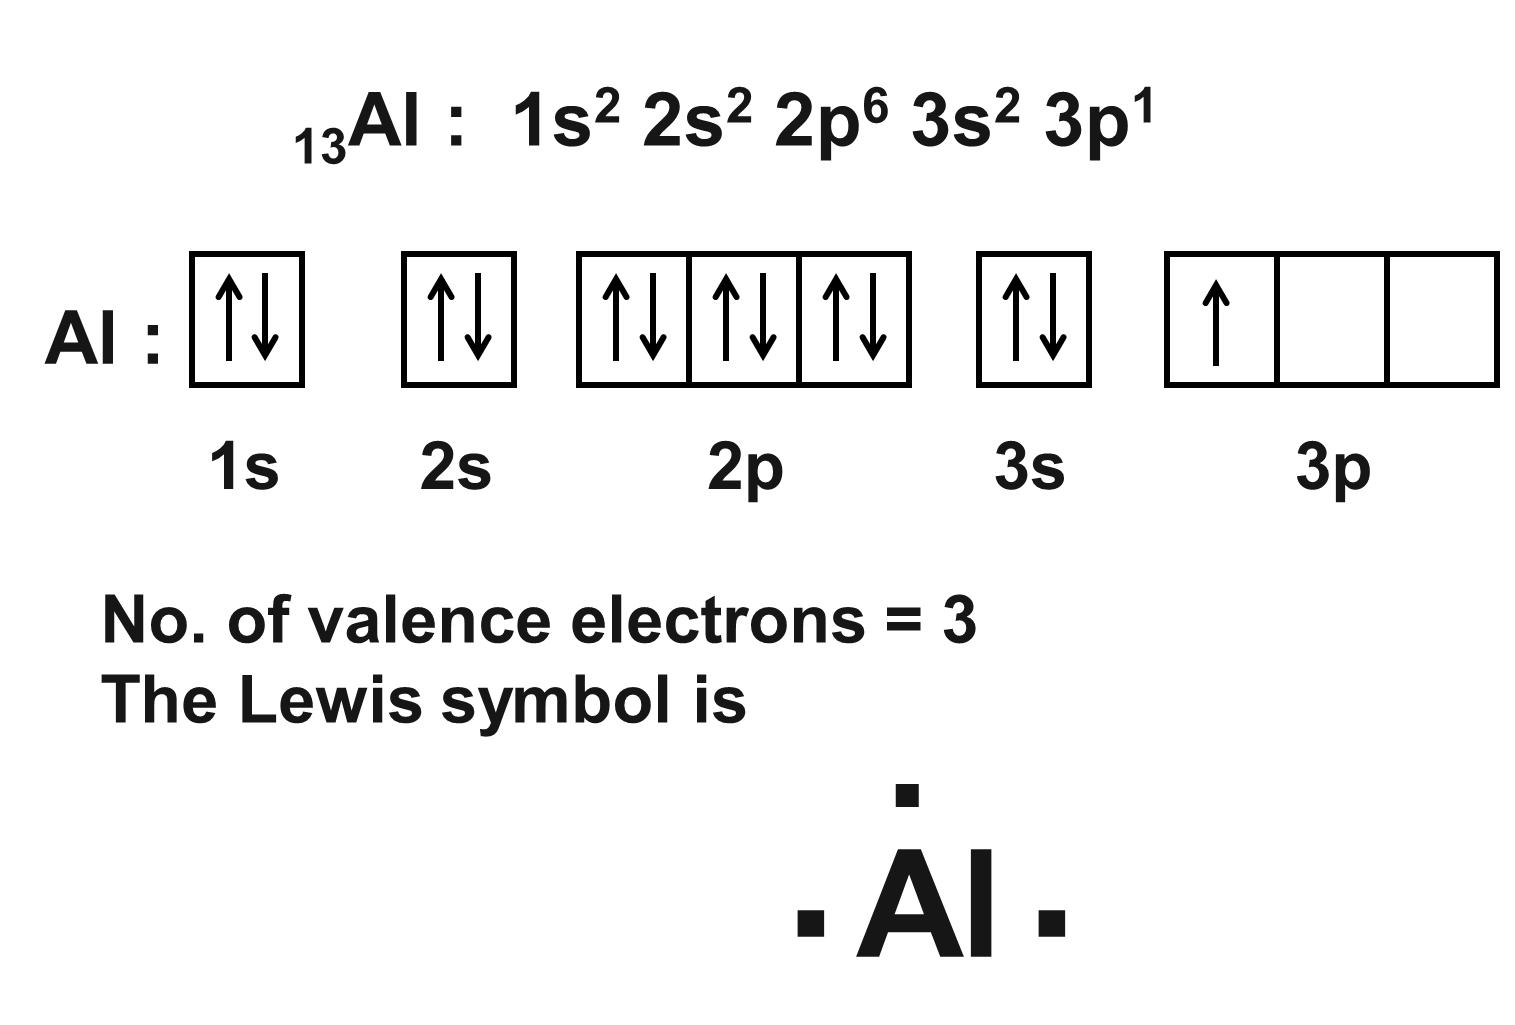 Suka chemistry august 2017 lewis symbol for al biocorpaavc